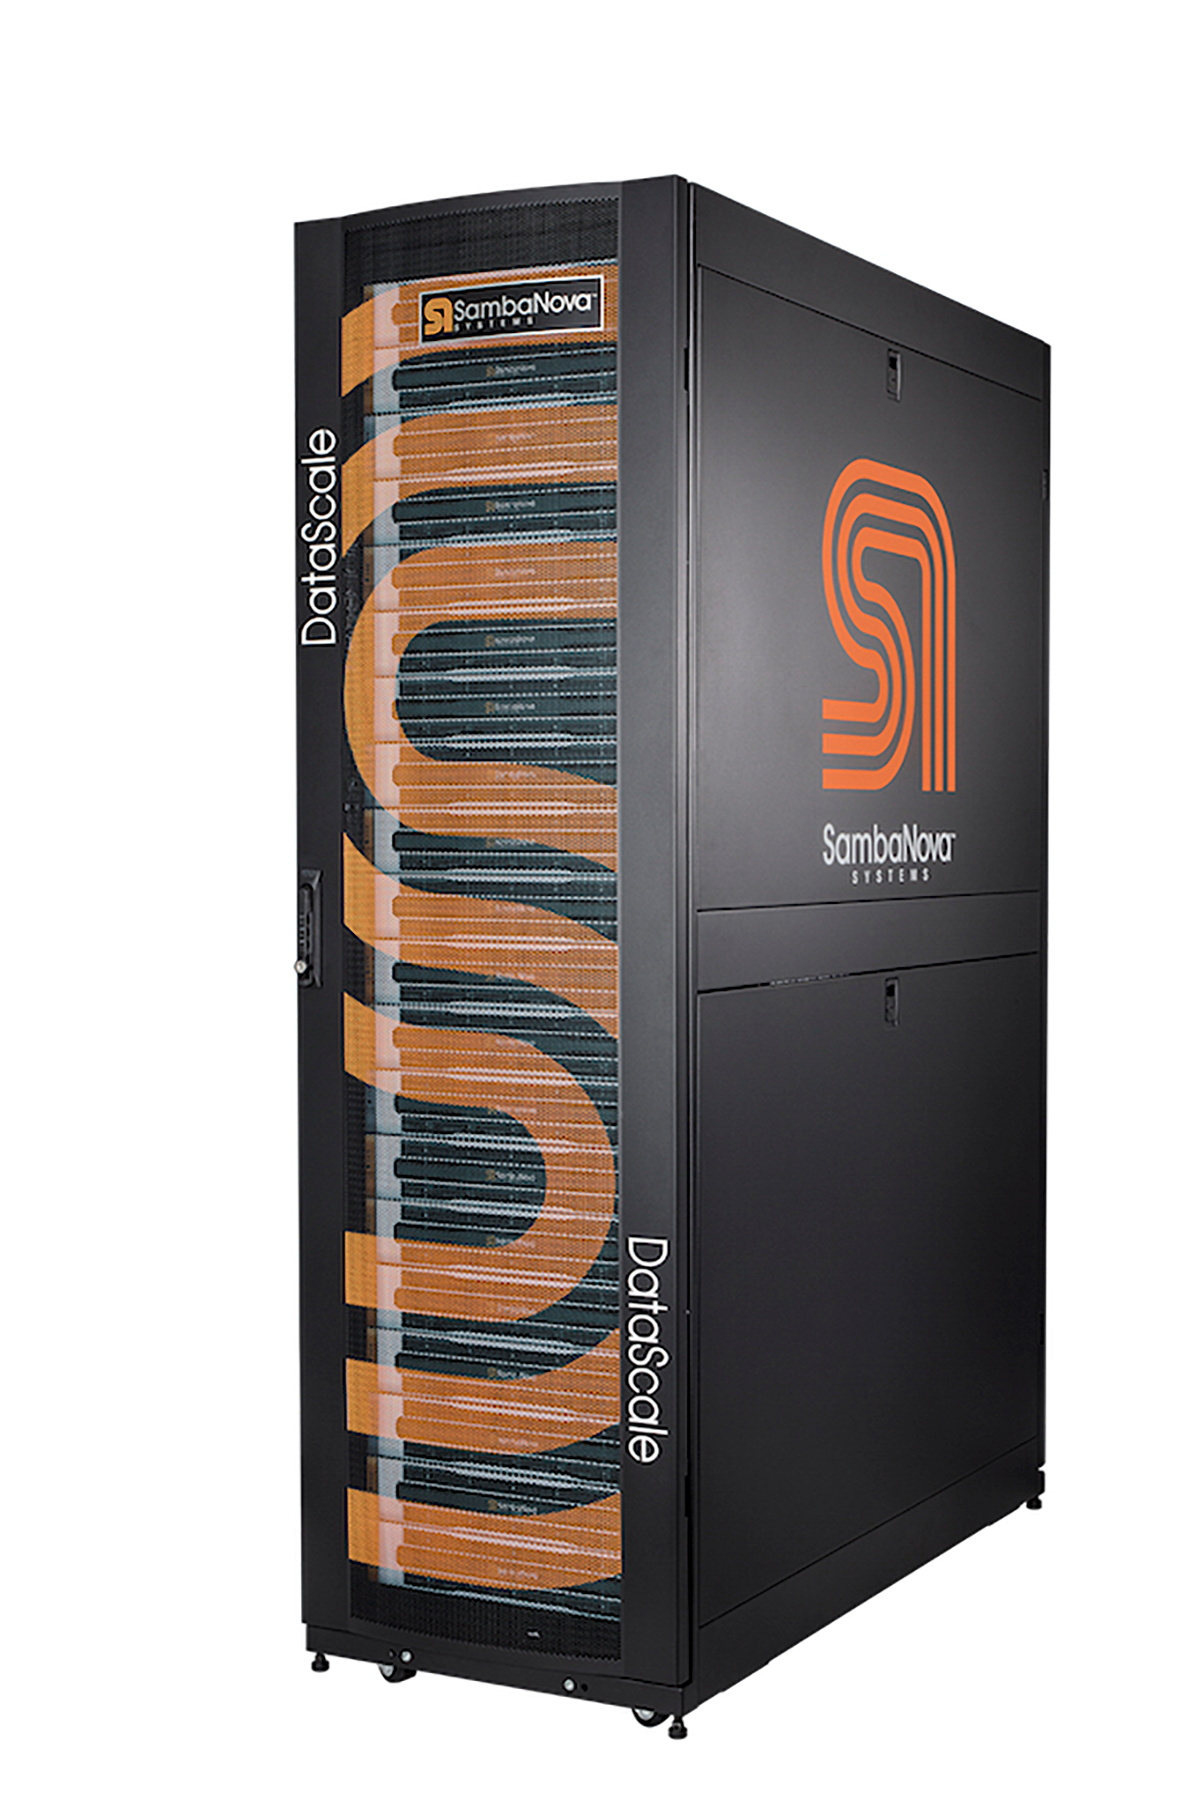 A data center server rack shows the logo of SambaNova Systems in this undated handout photo.  SambaNova/Handout via REUTERS